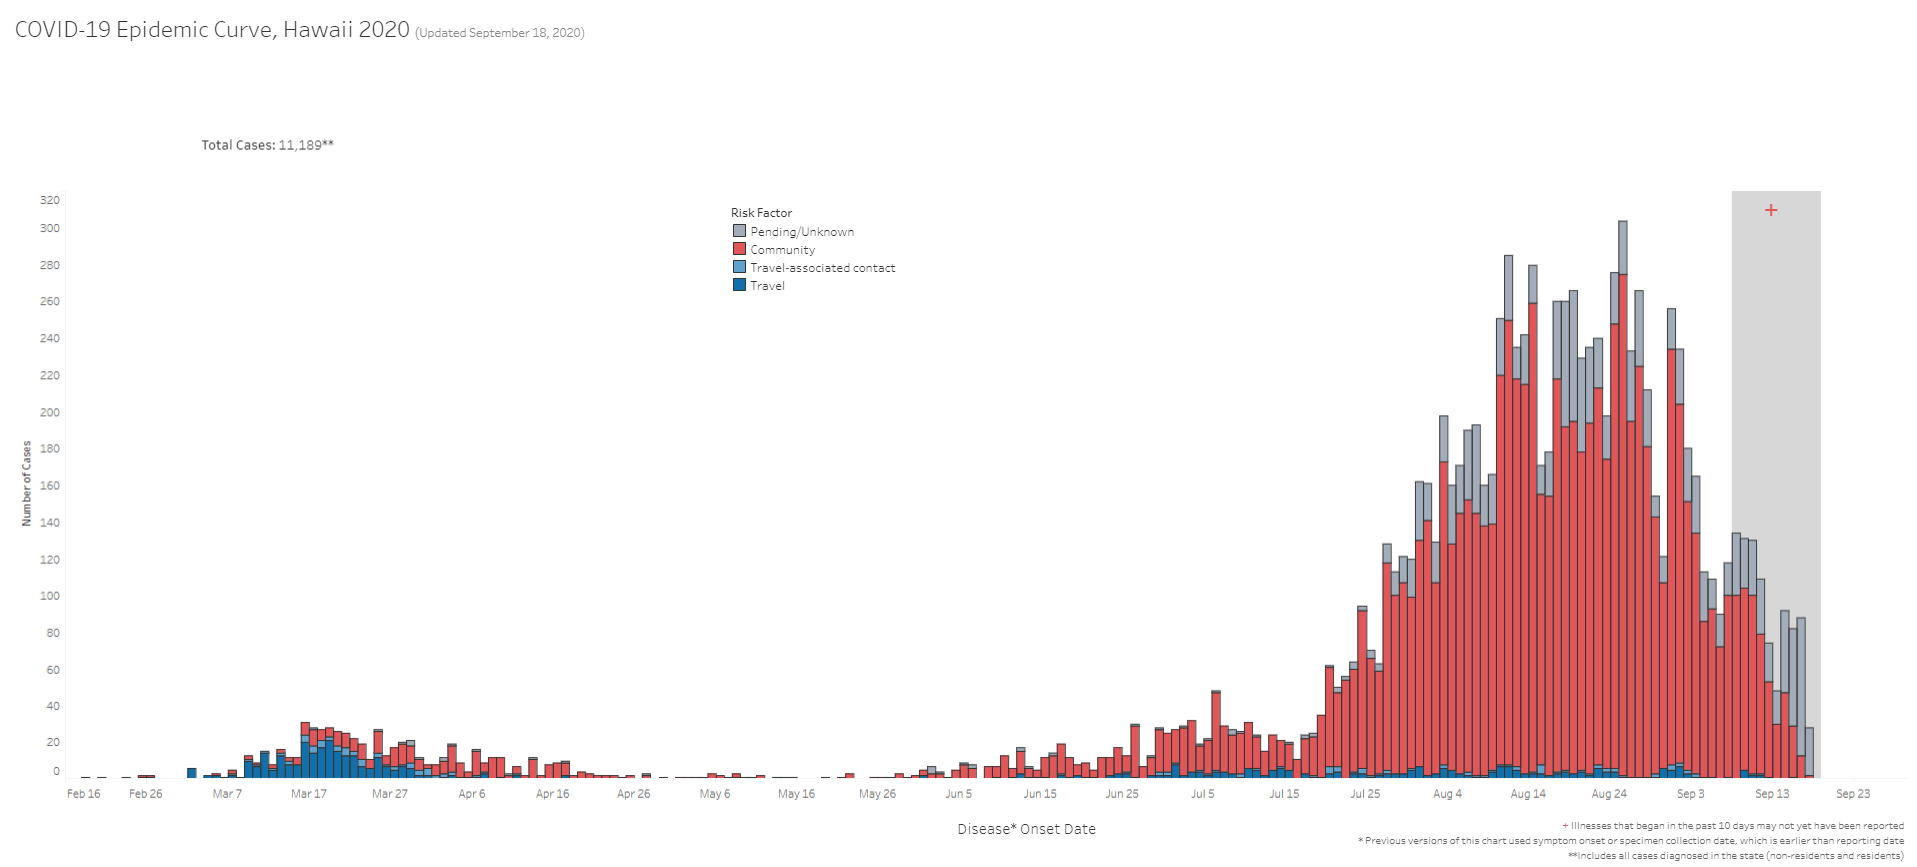 COVID-19 Epidemic Curve Hawaii September 18, 2020